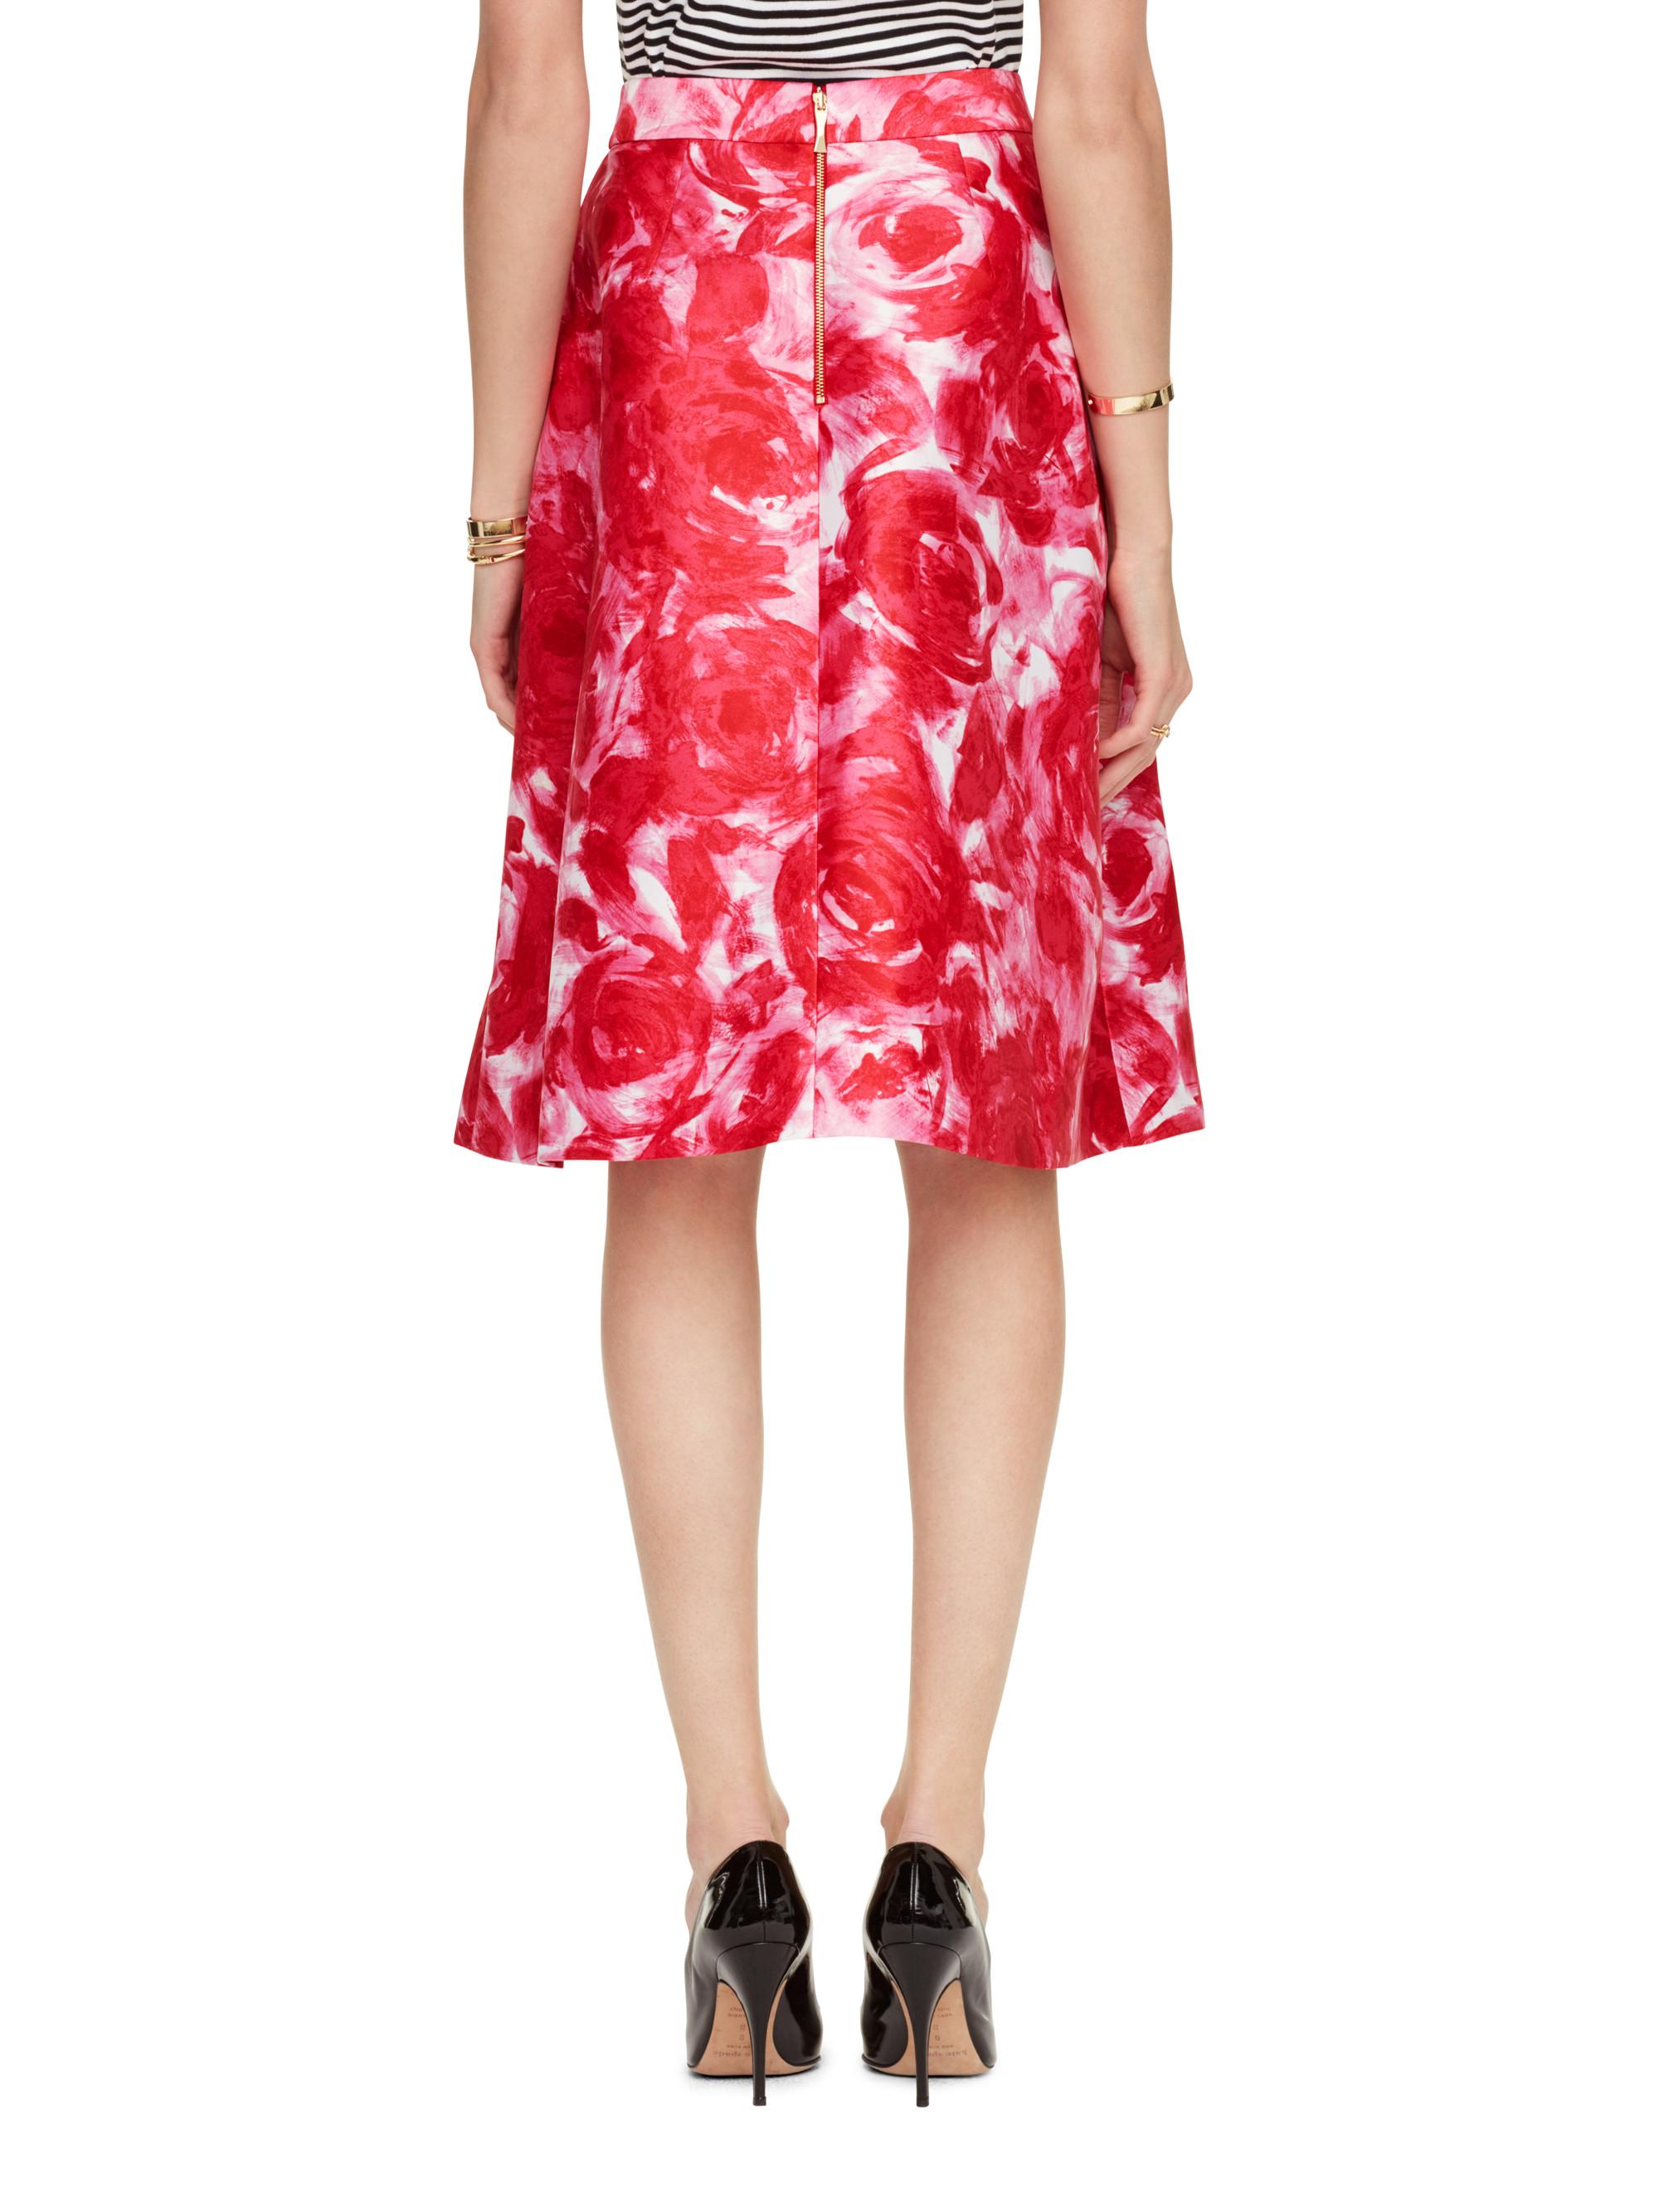 a6e6f353b9 Kate Spade Brushstroke Rose Crista Skirt in Red - Lyst